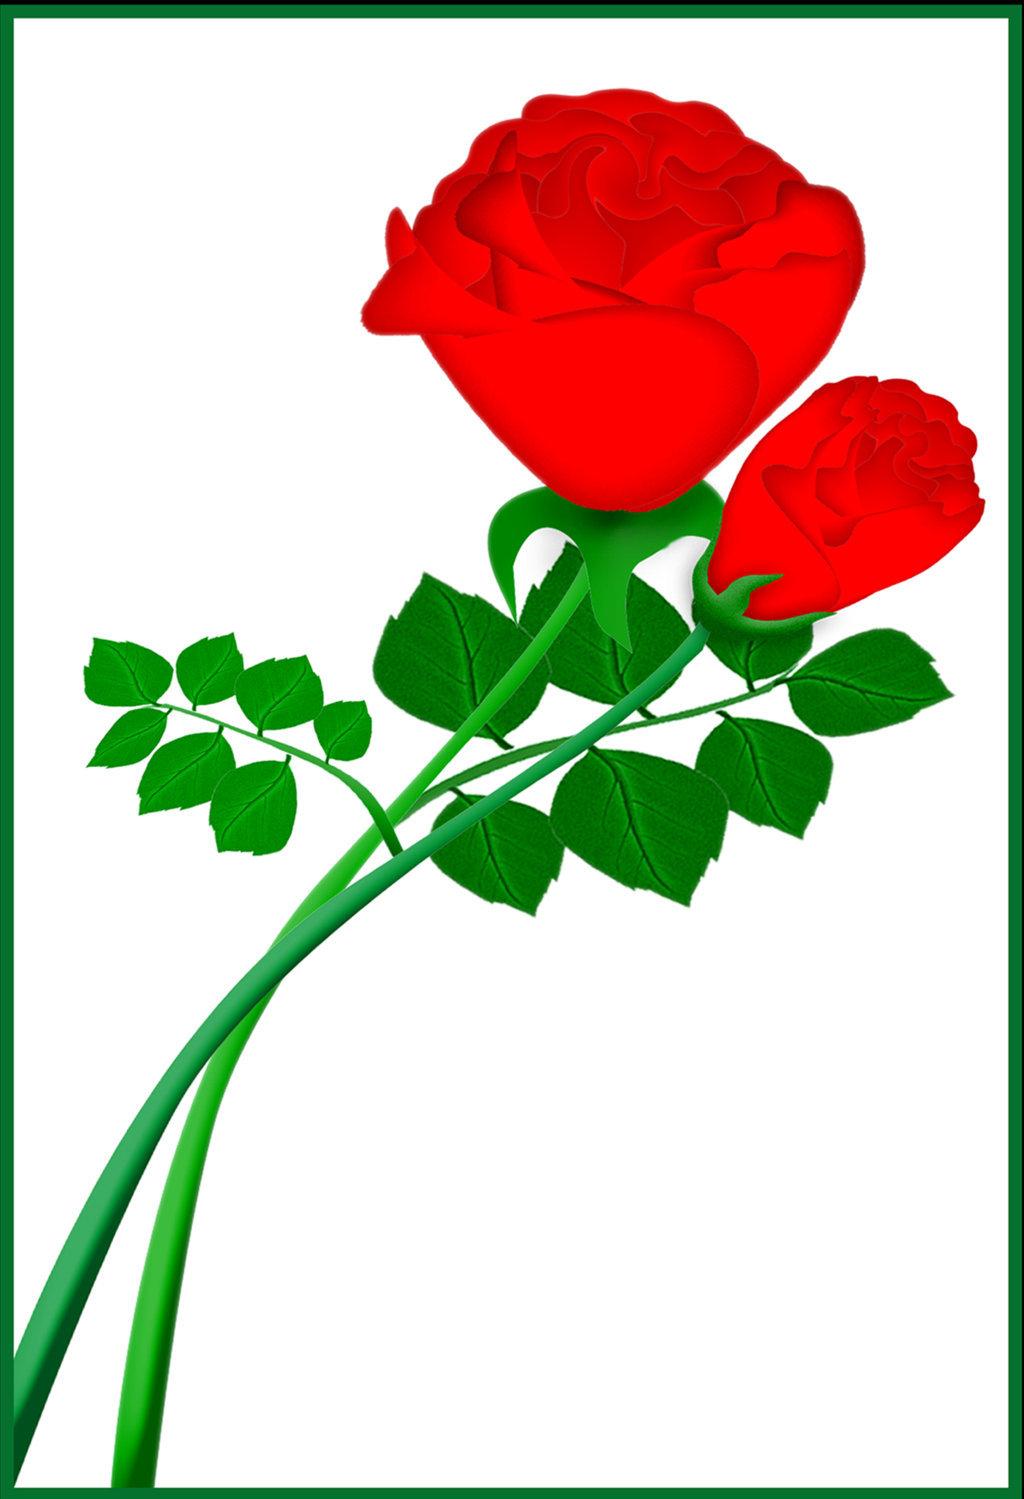 Membuat Gambar Bunga Mawar Dengan Photoshop Pandu Pinuji